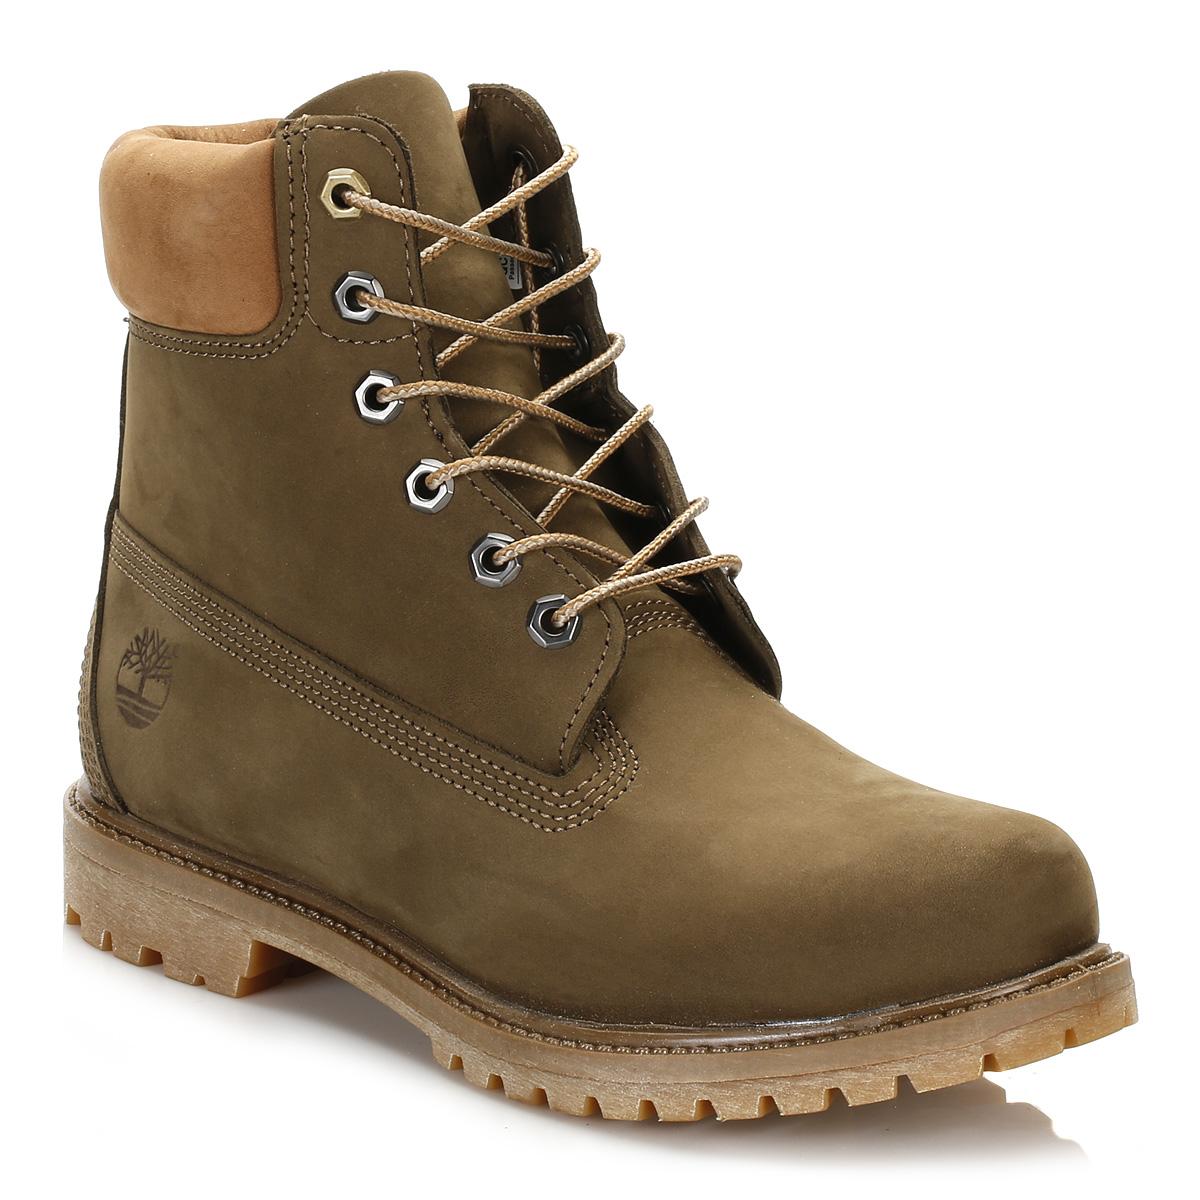 Timberland Womens Boots Dark Olive 6 Inch Premium